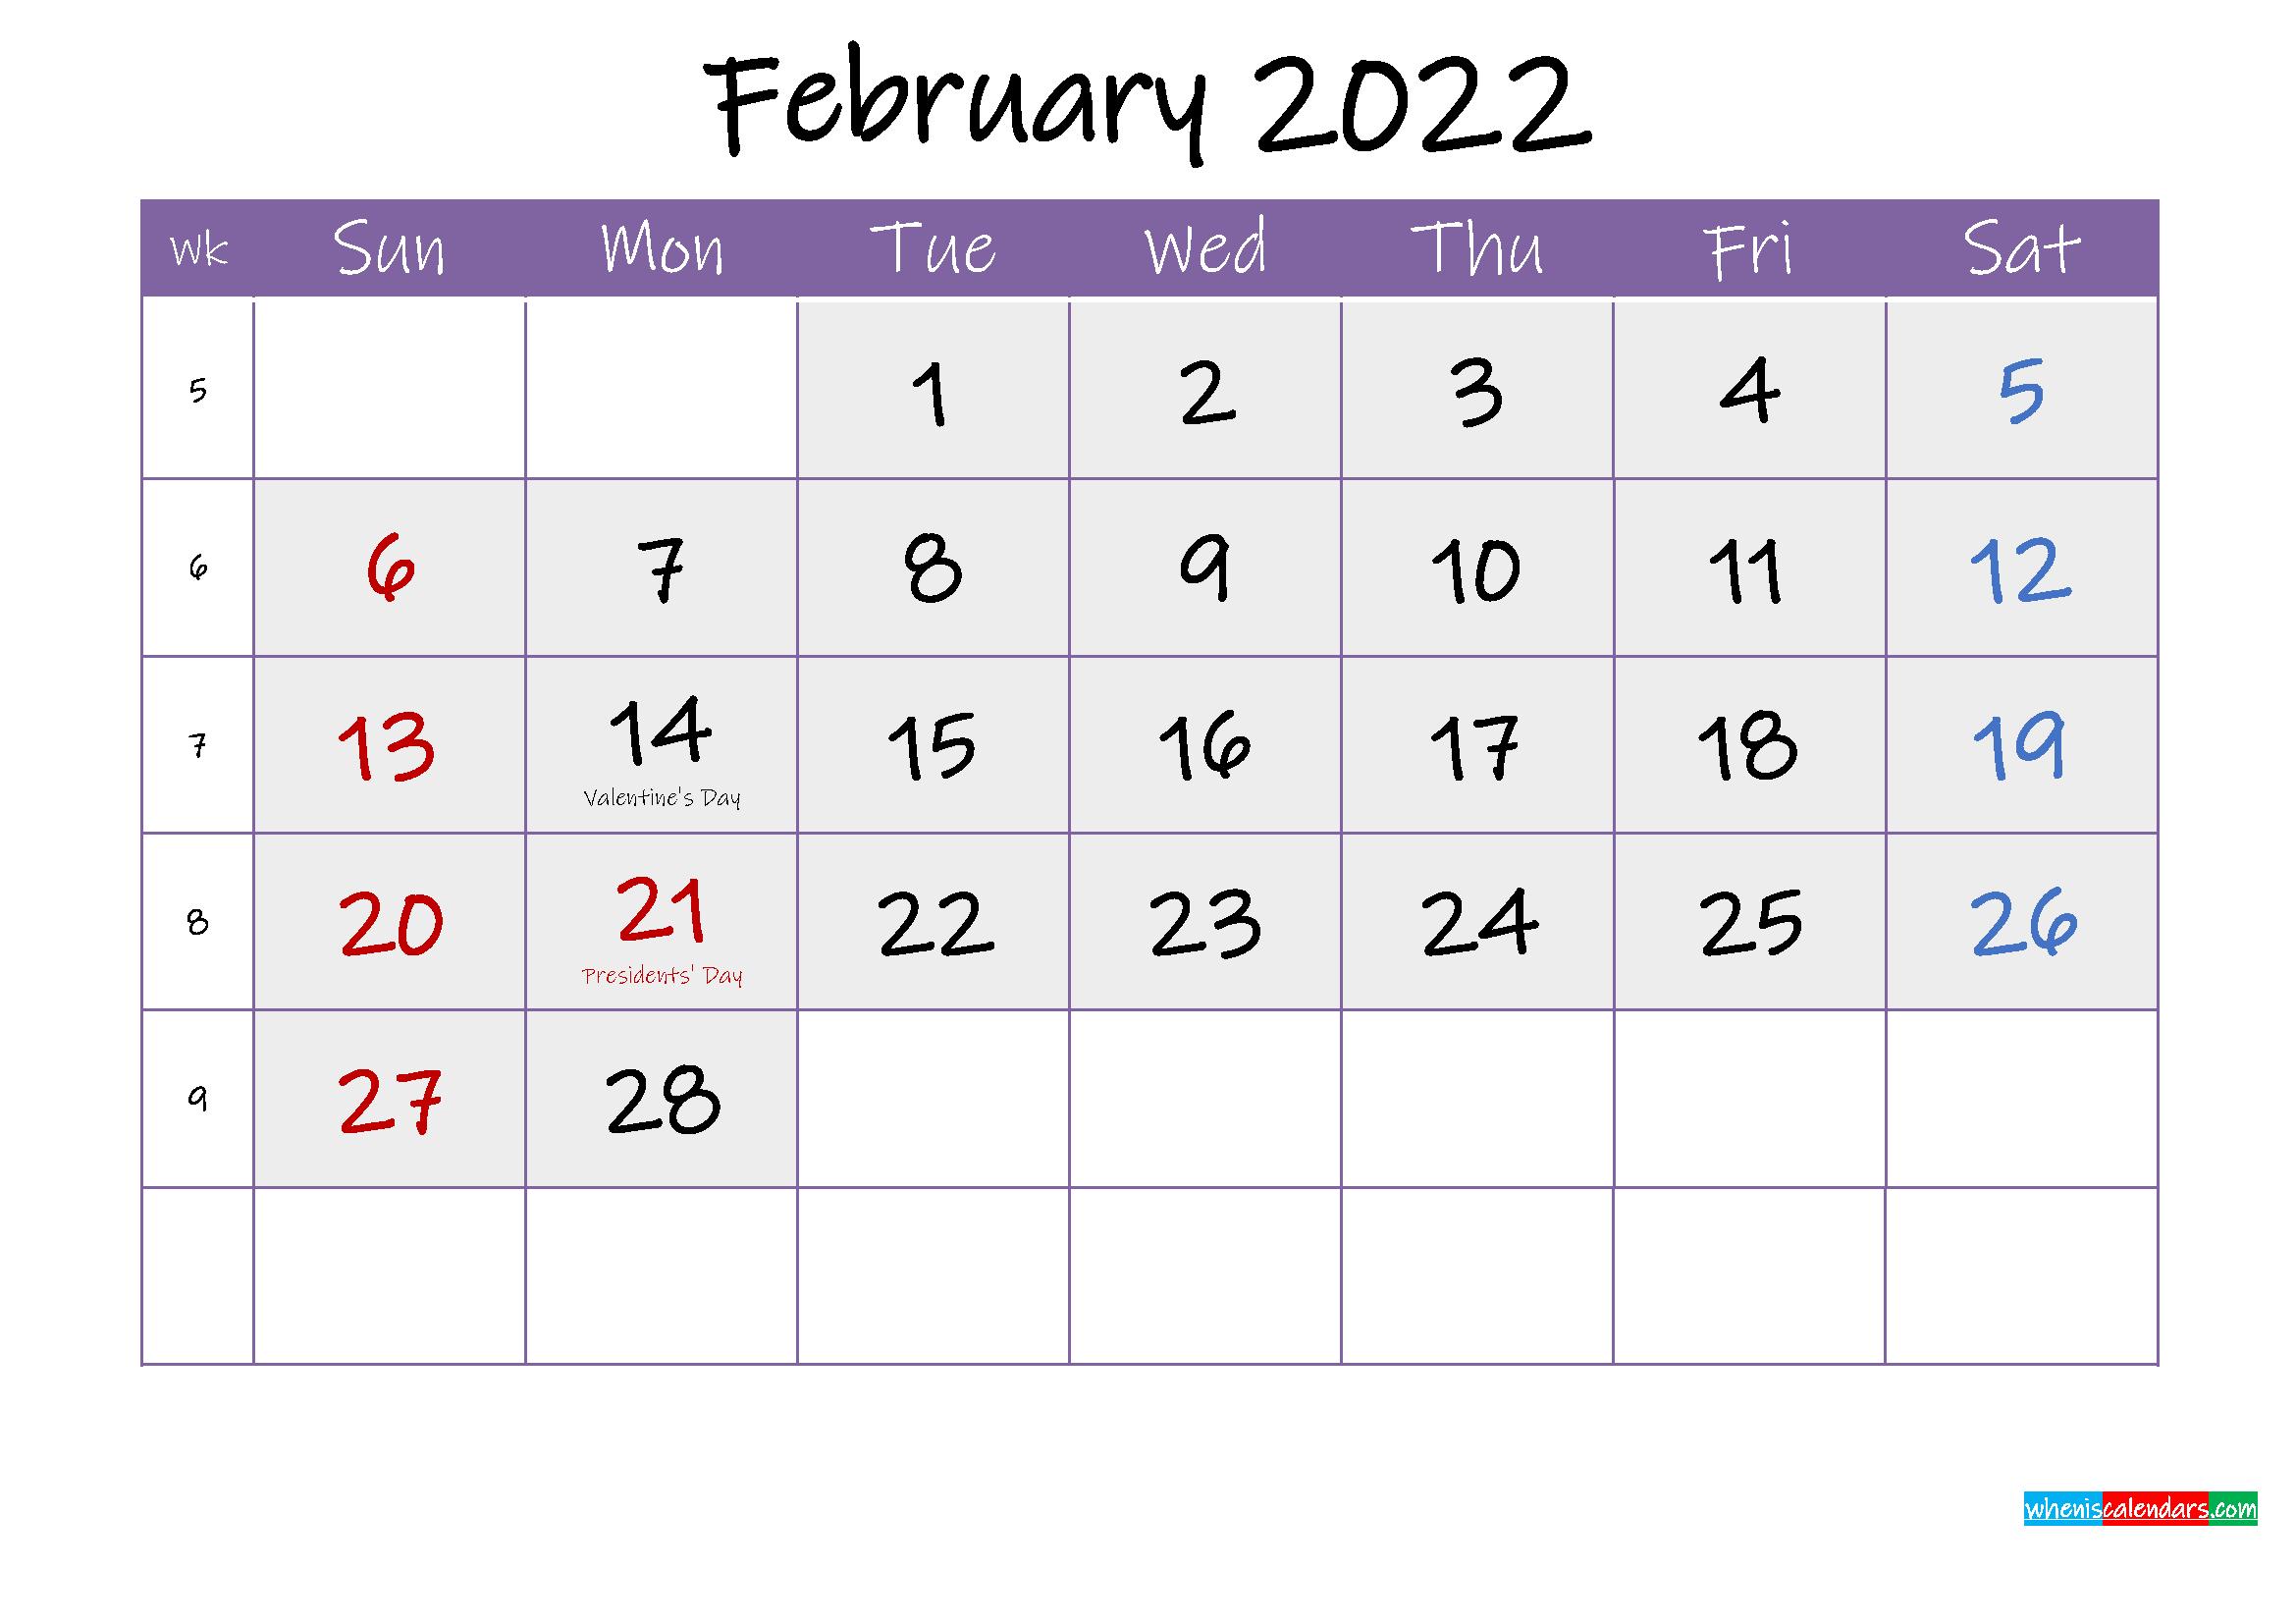 Free February 2022 Printable Calendar with Holidays